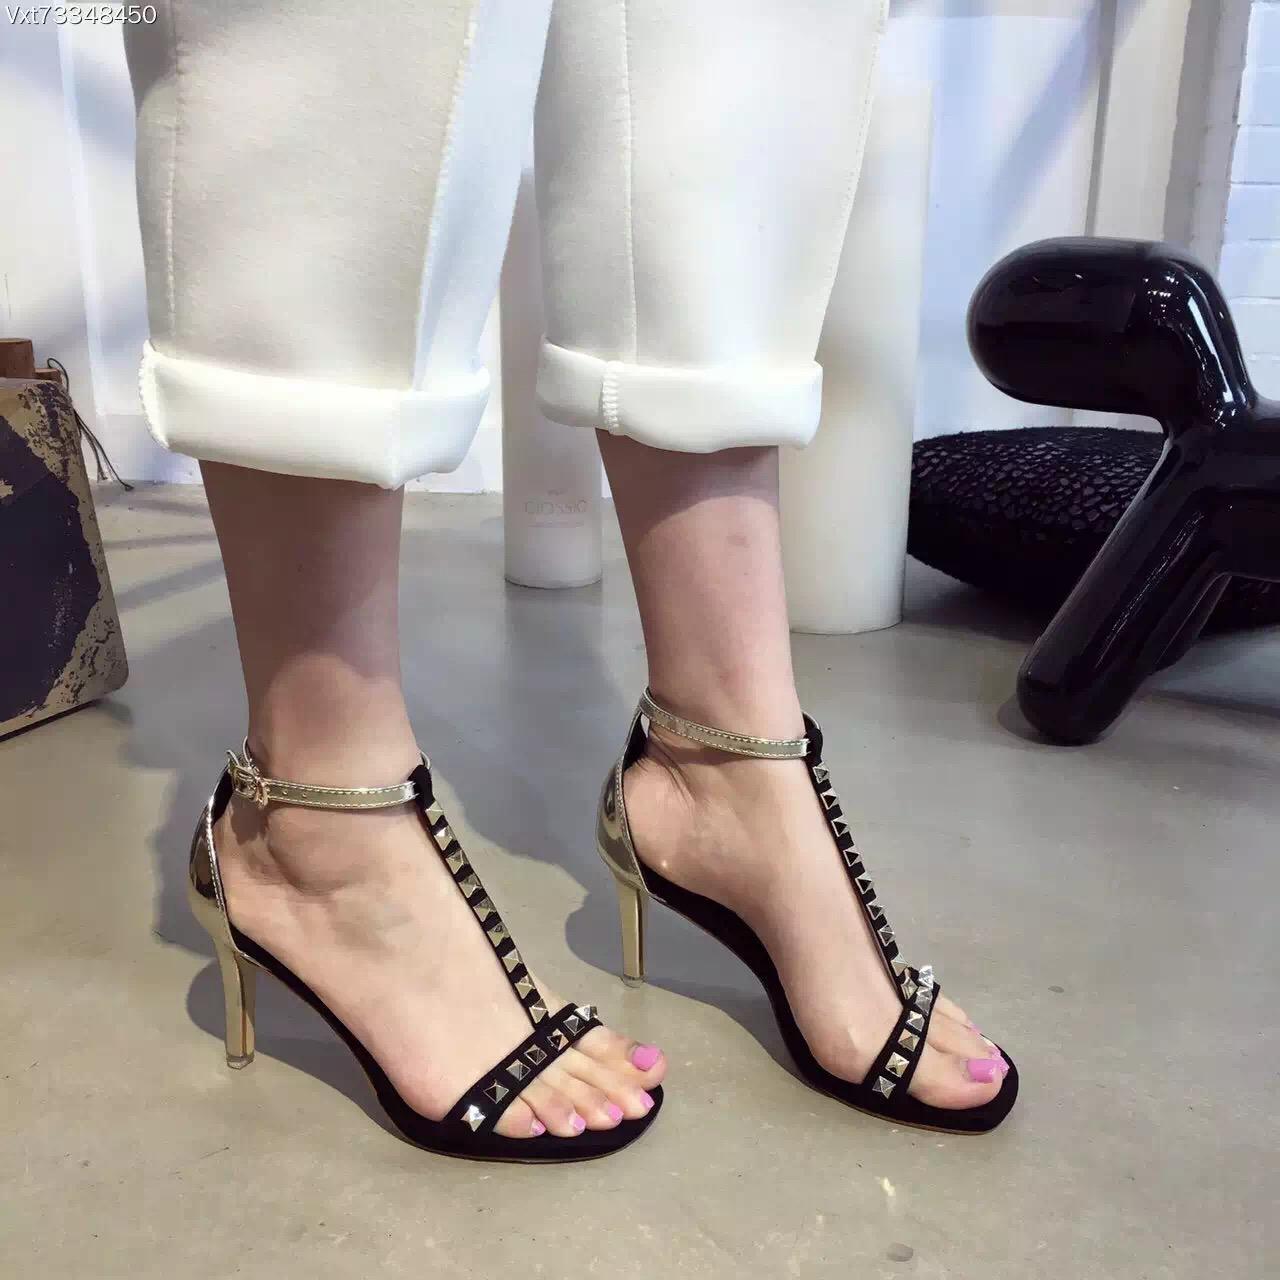 2016 Sexy Fashion Rivets High Heel Sandals Gold Heel 8.5cm Platform 1cm Comfortable Summer Sandals Black Red Silver Suede(China (Mainland))